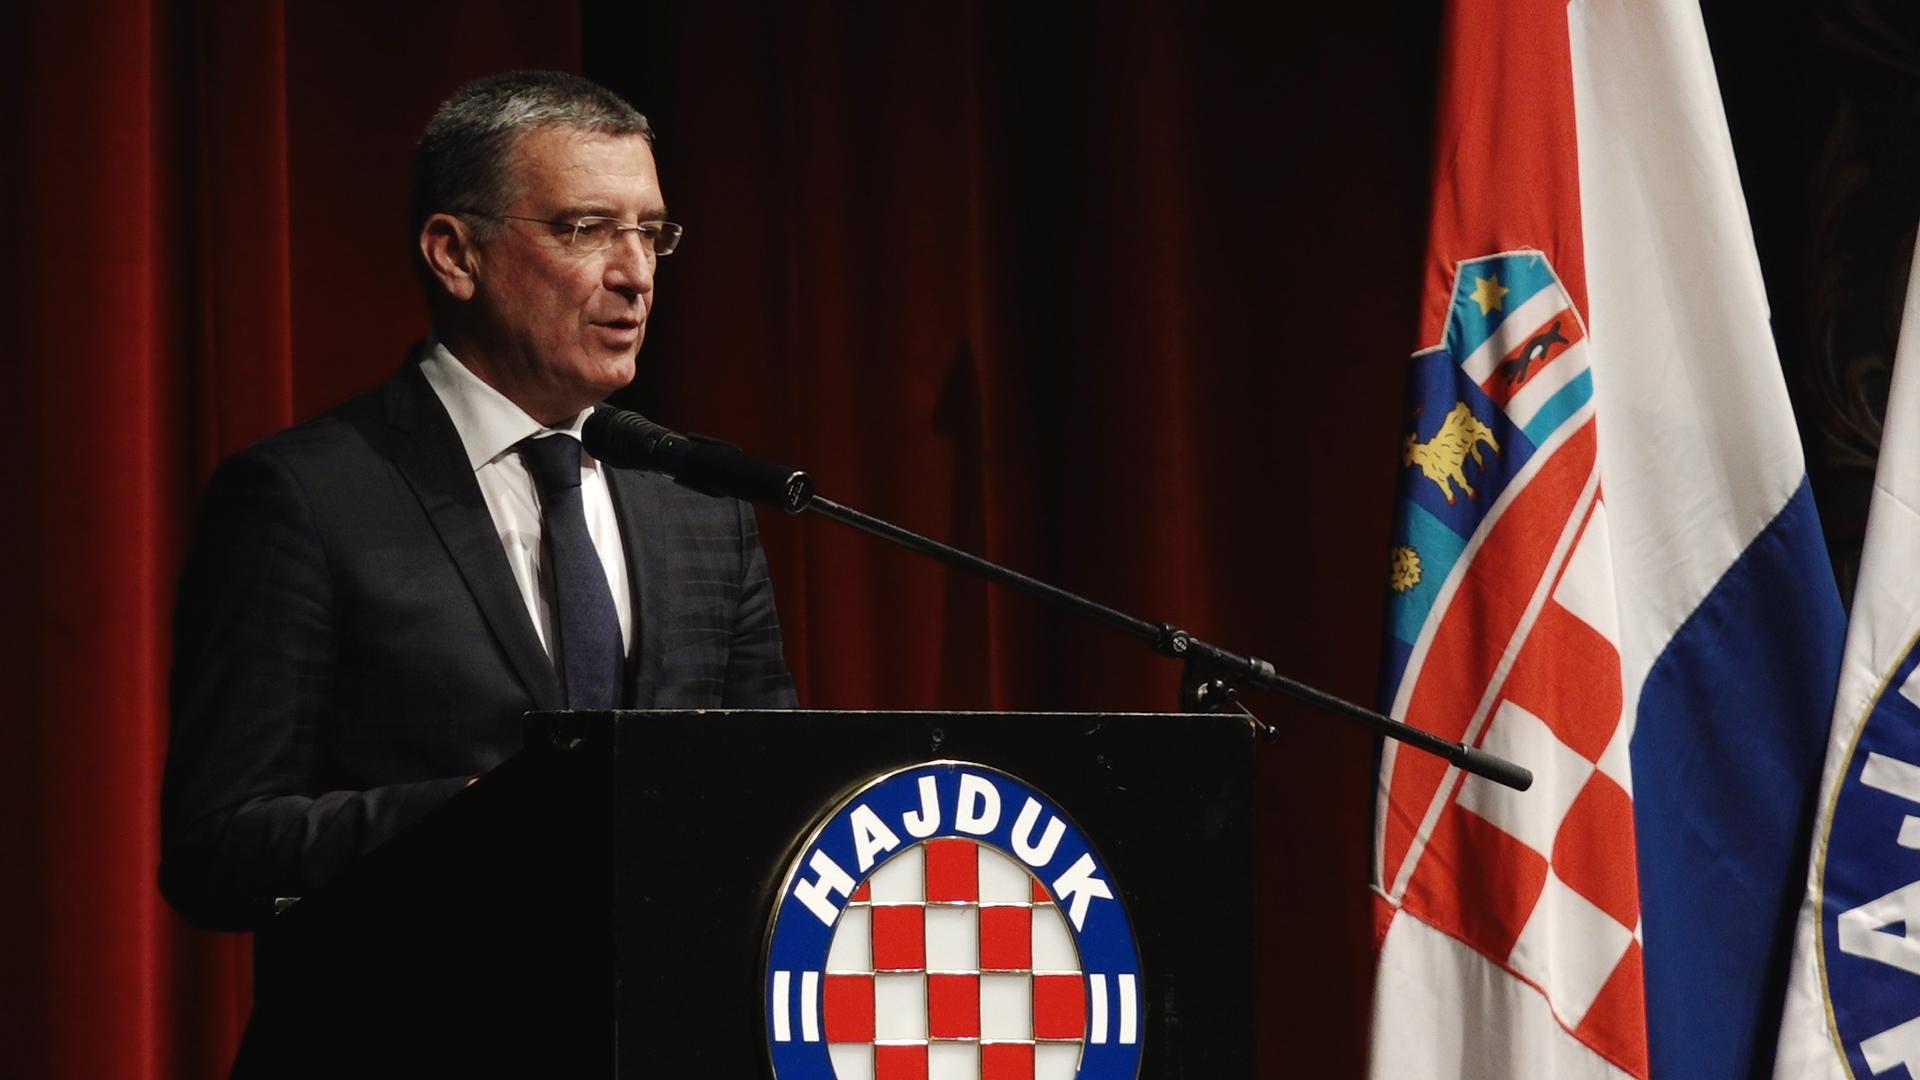 Gradonačelnik i župan čestitali Hajduku na velikoj obljetnici